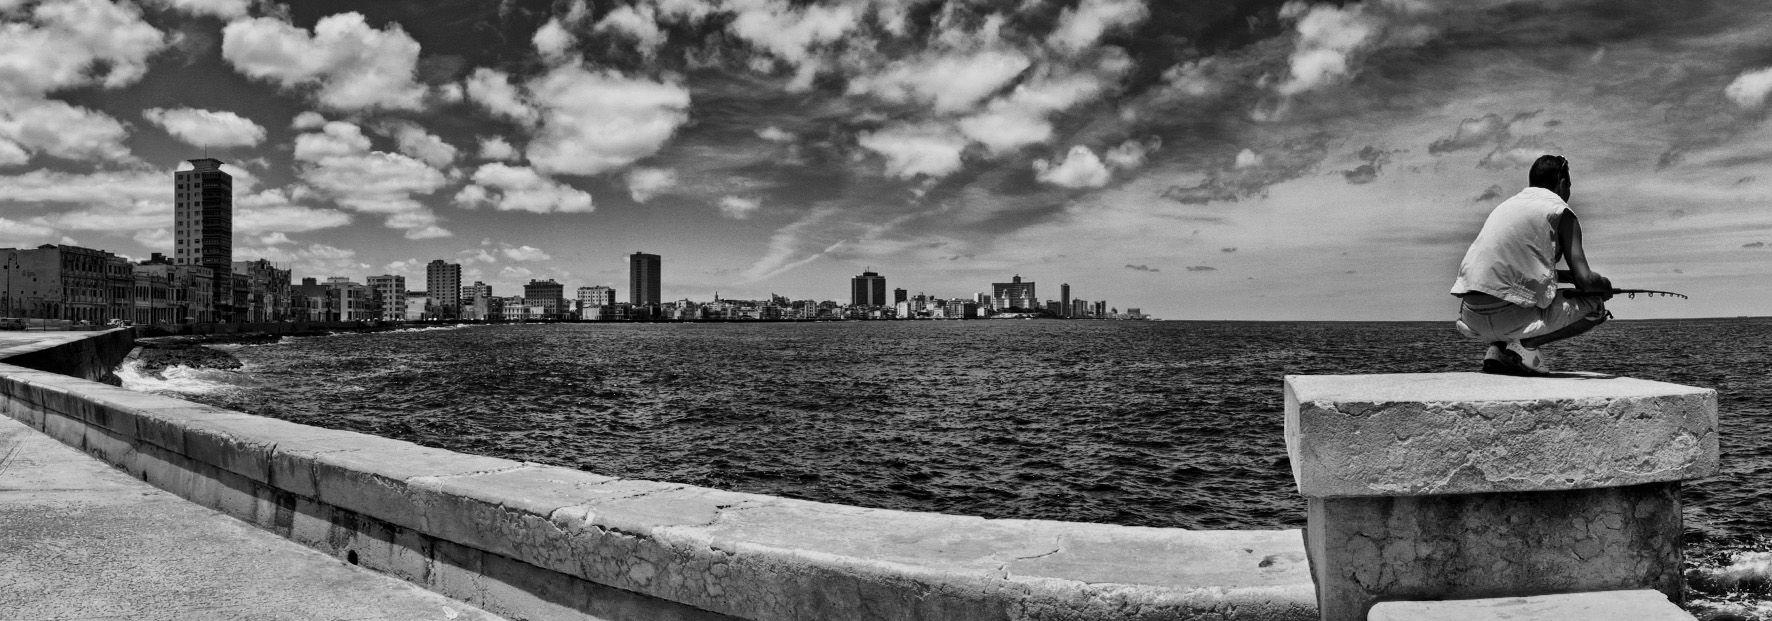 Havanasan antonio cuba colour black and white travel